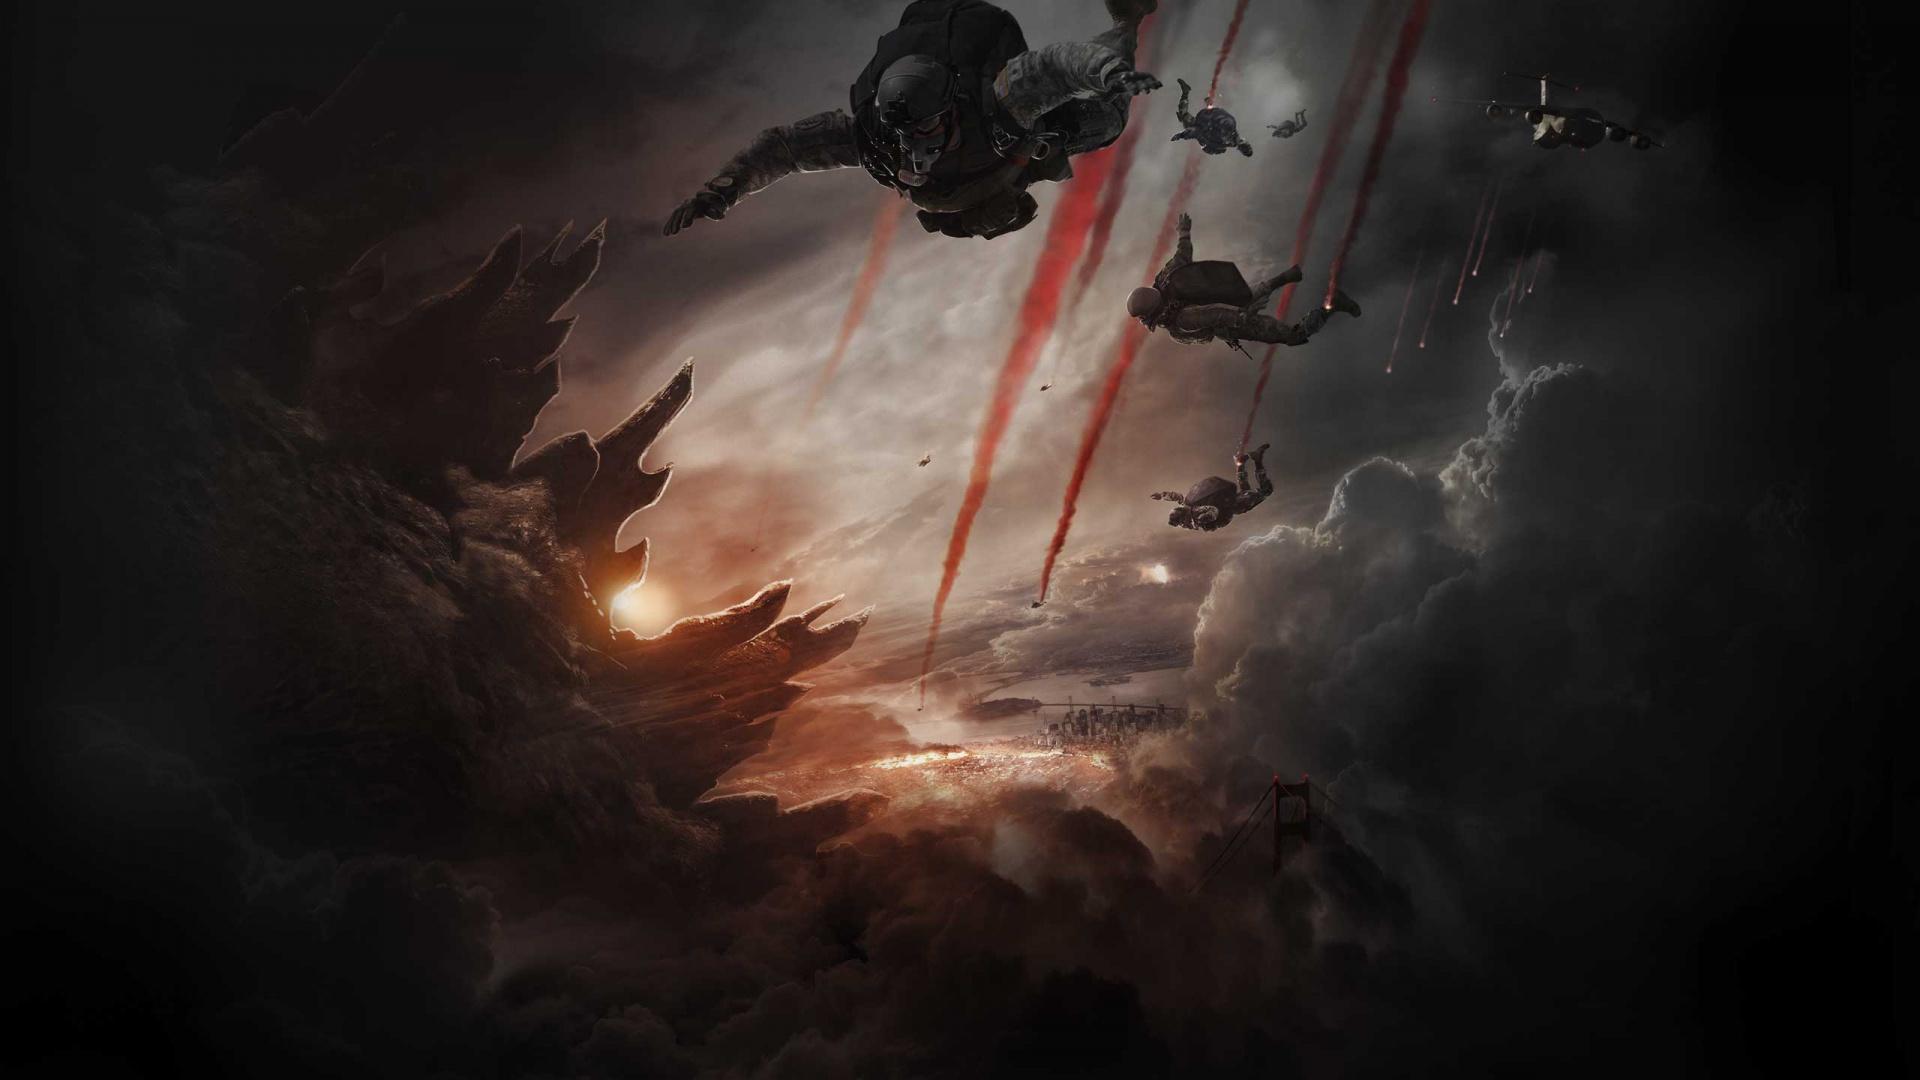 Godzilla 2014 Movie Wallpapers HD Wallpapers 1920x1080